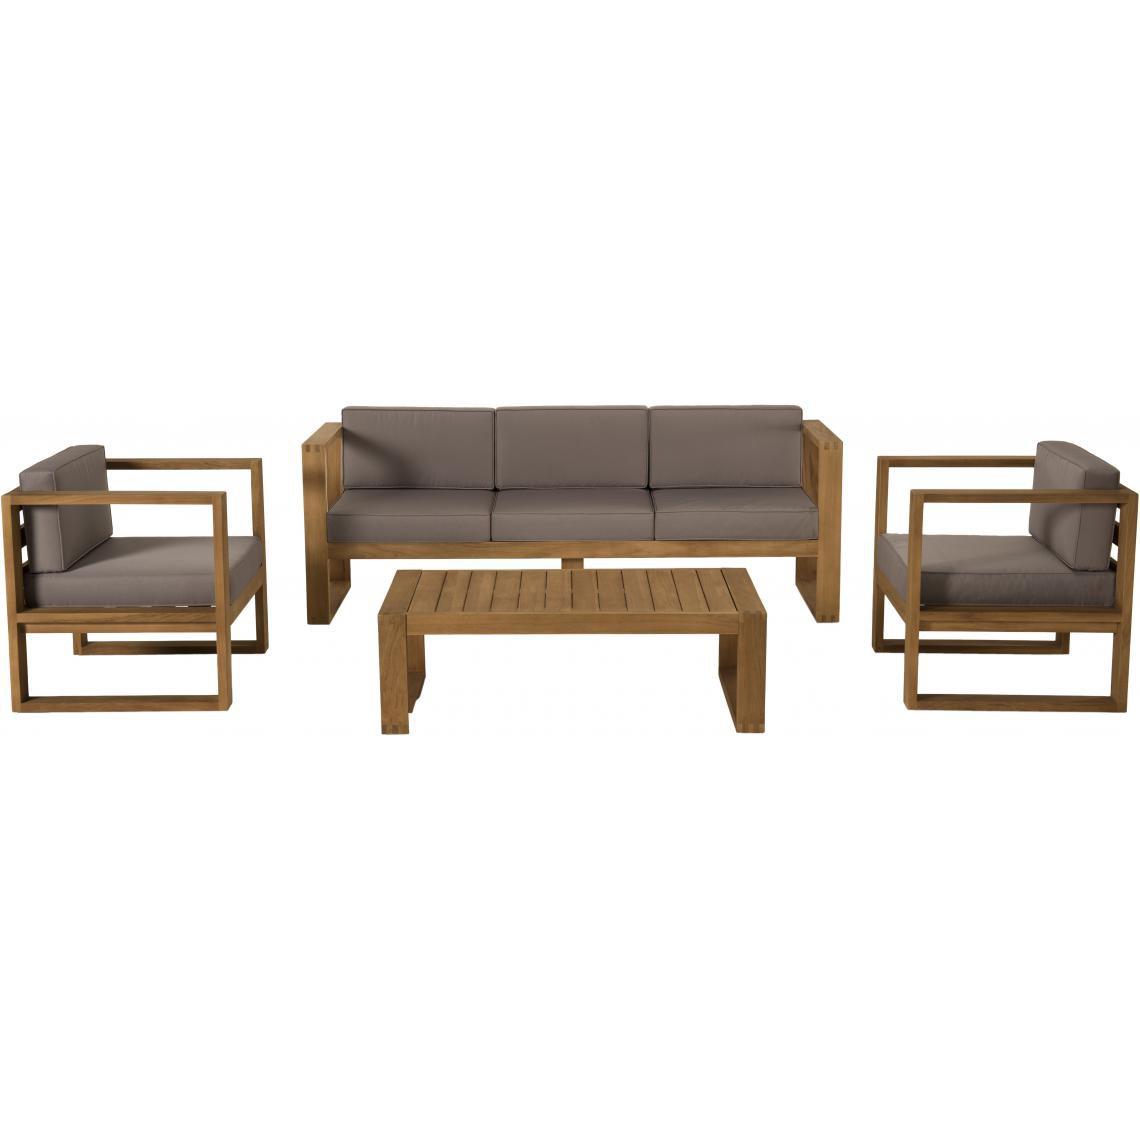 salon de jardin majorque table basse teck canape 3 places 2 fauteuils